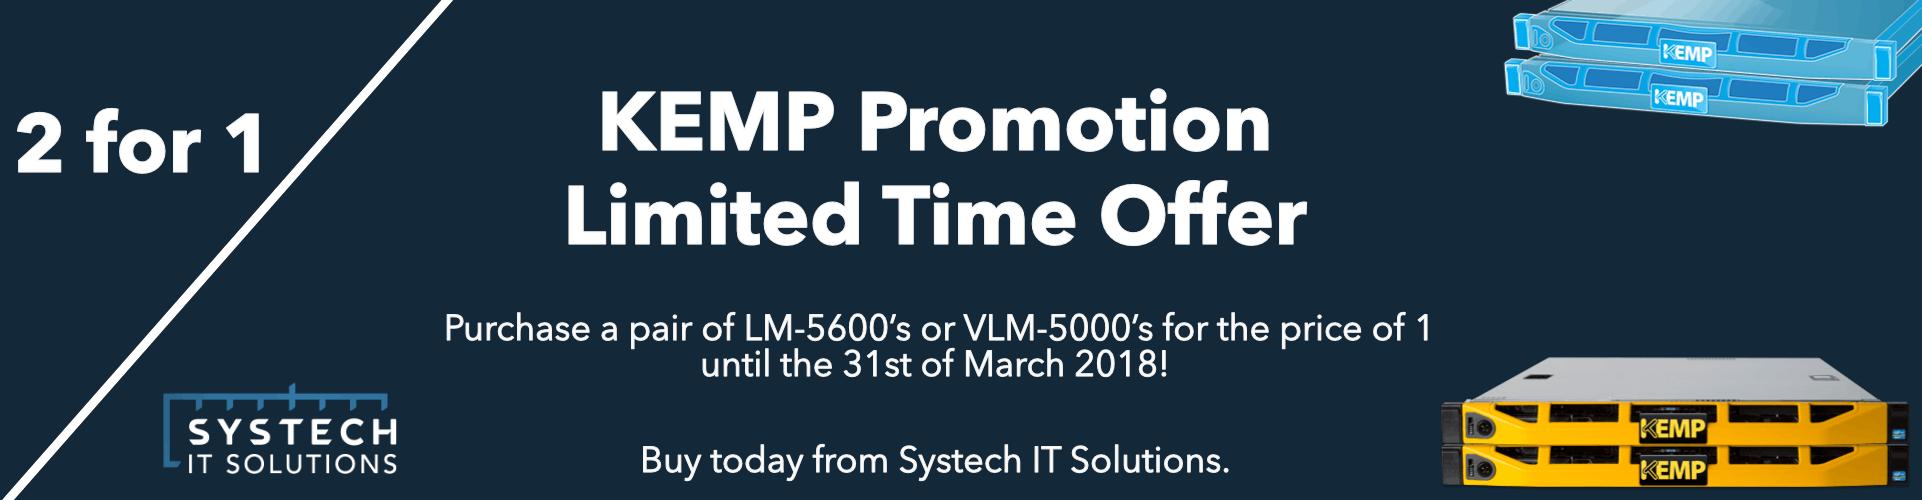 KEMP VLM 5000 2 for 1 Promotion, KEMP LM 5600 2 for 1 Promotion